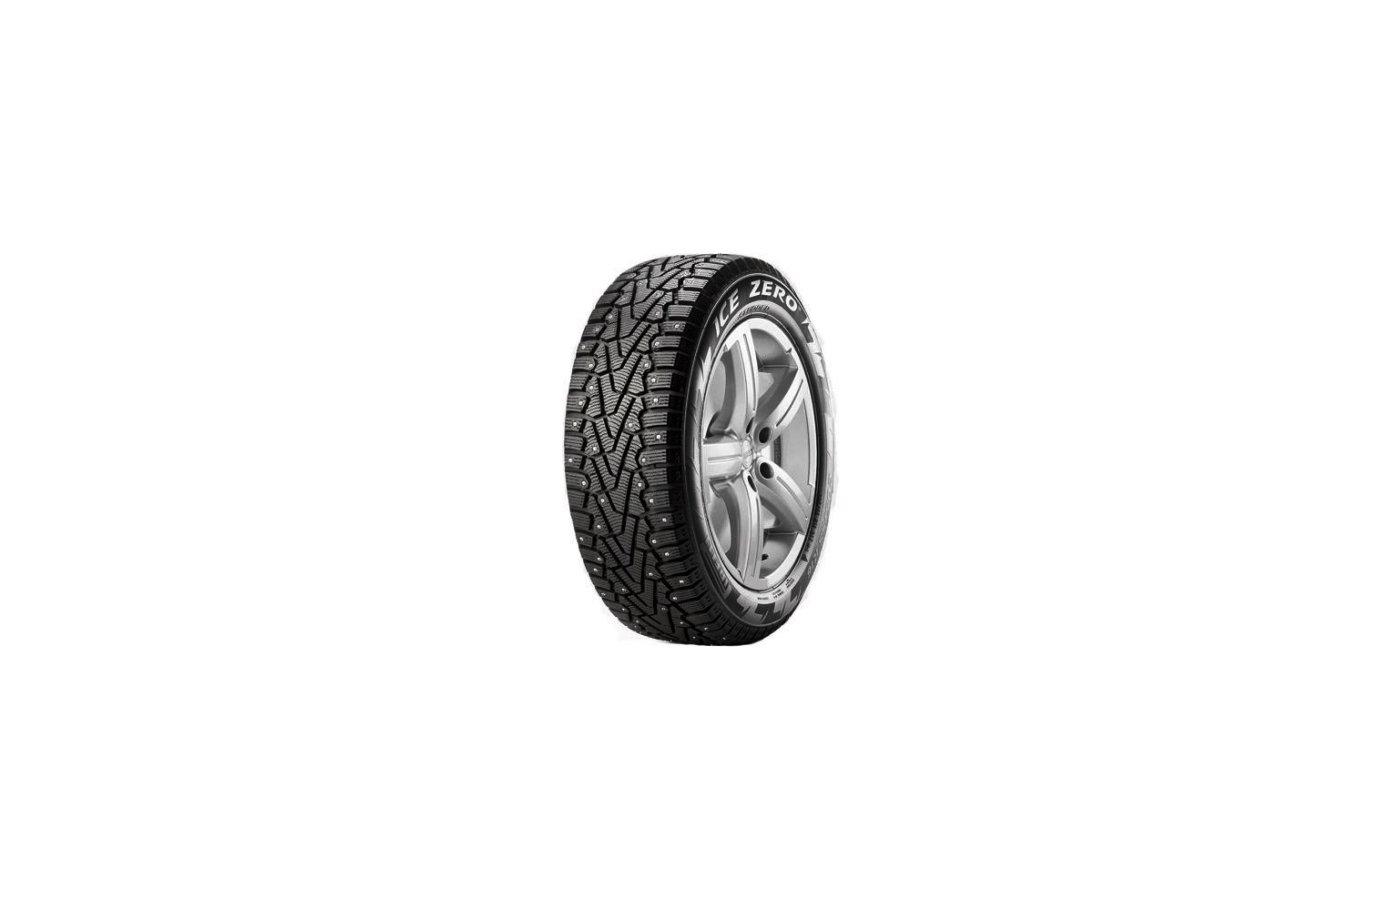 Шина Pirelli Ice Zero 255/55 R20 TL 110T XL шип